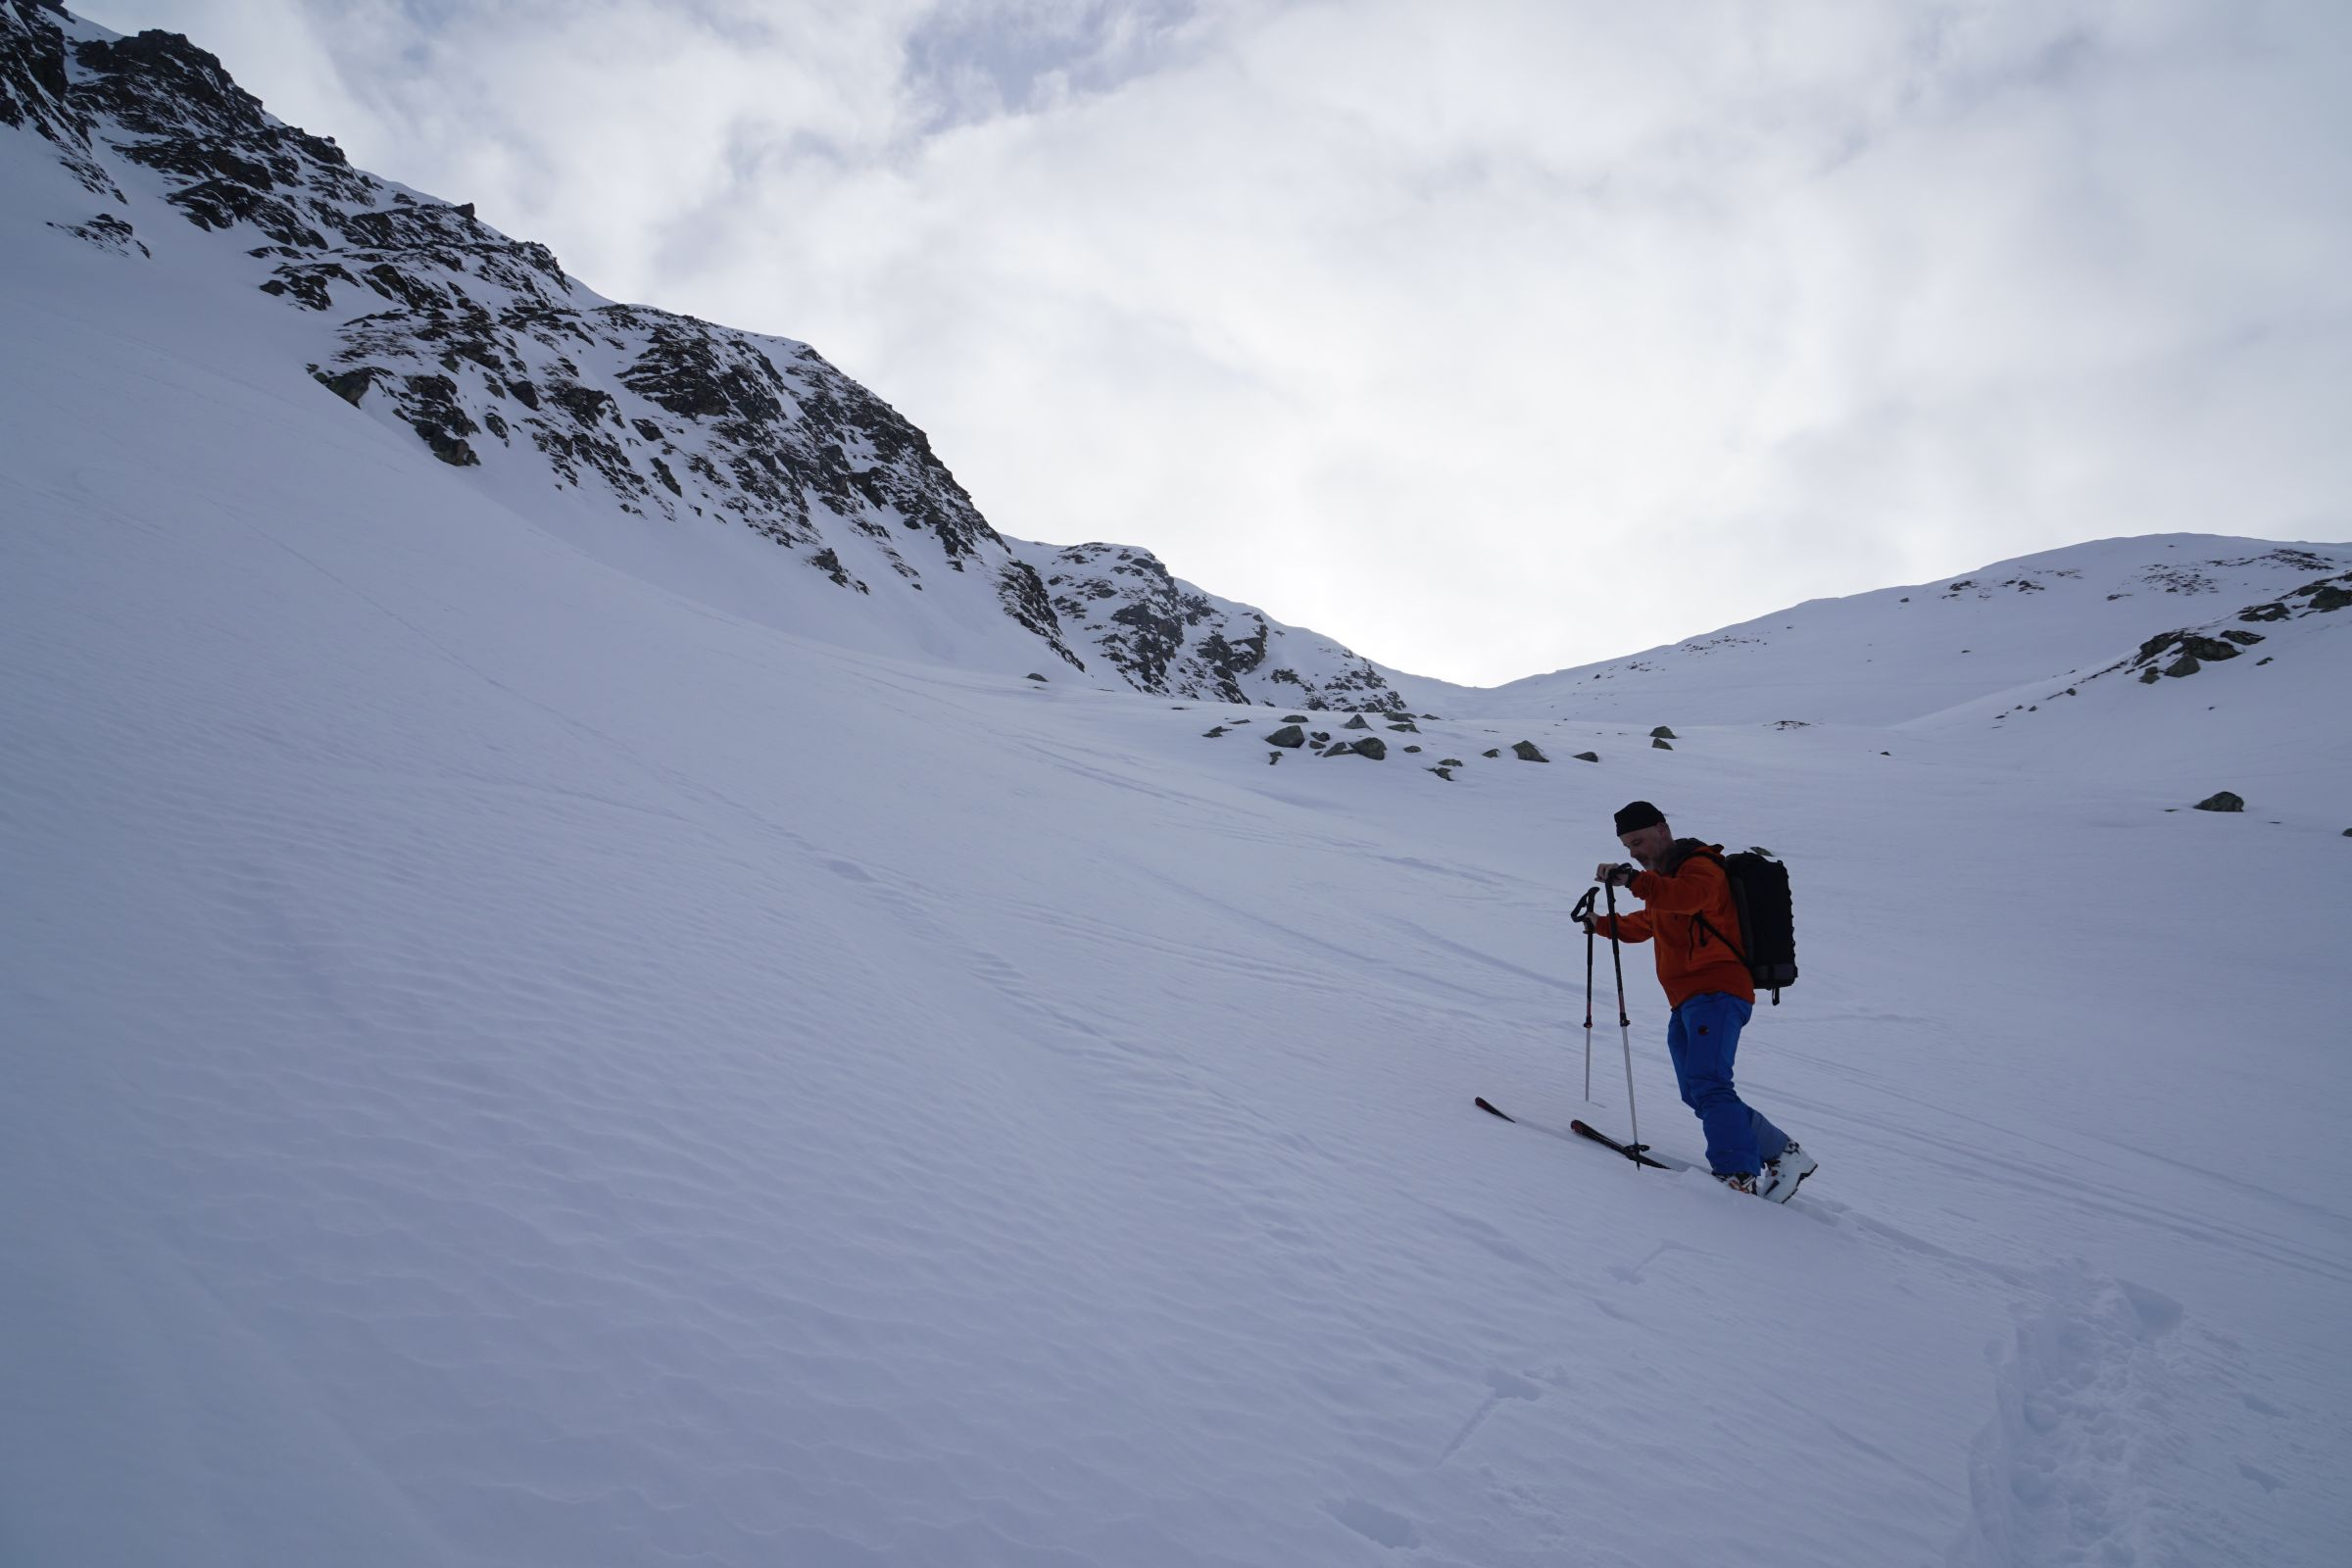 Skitour Geissweidengrat Pt. 2684m 25.01.2020